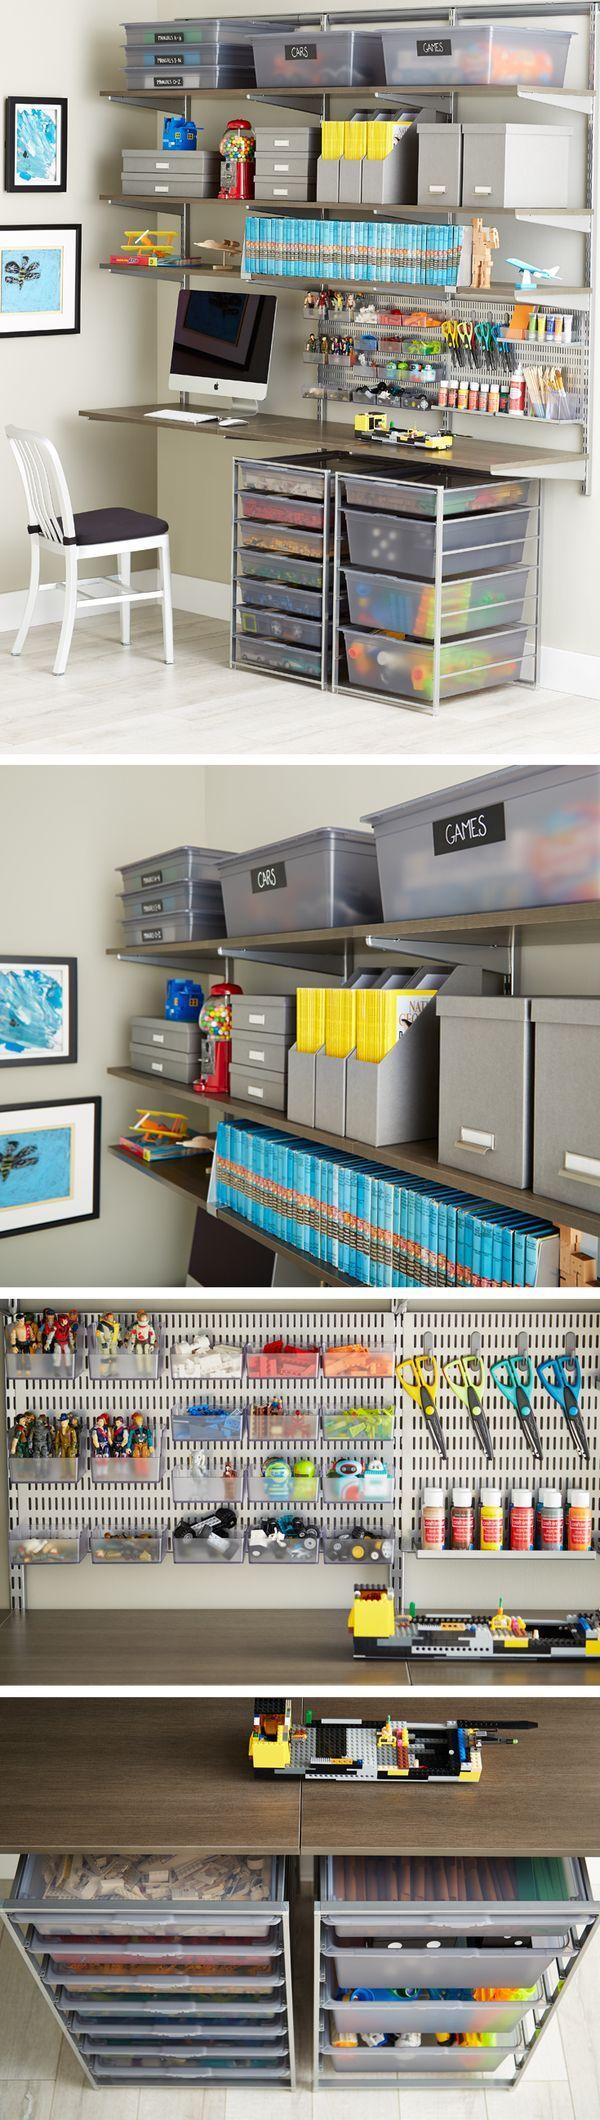 17 best images about elfa office on pinterest storage for Elfa desk system